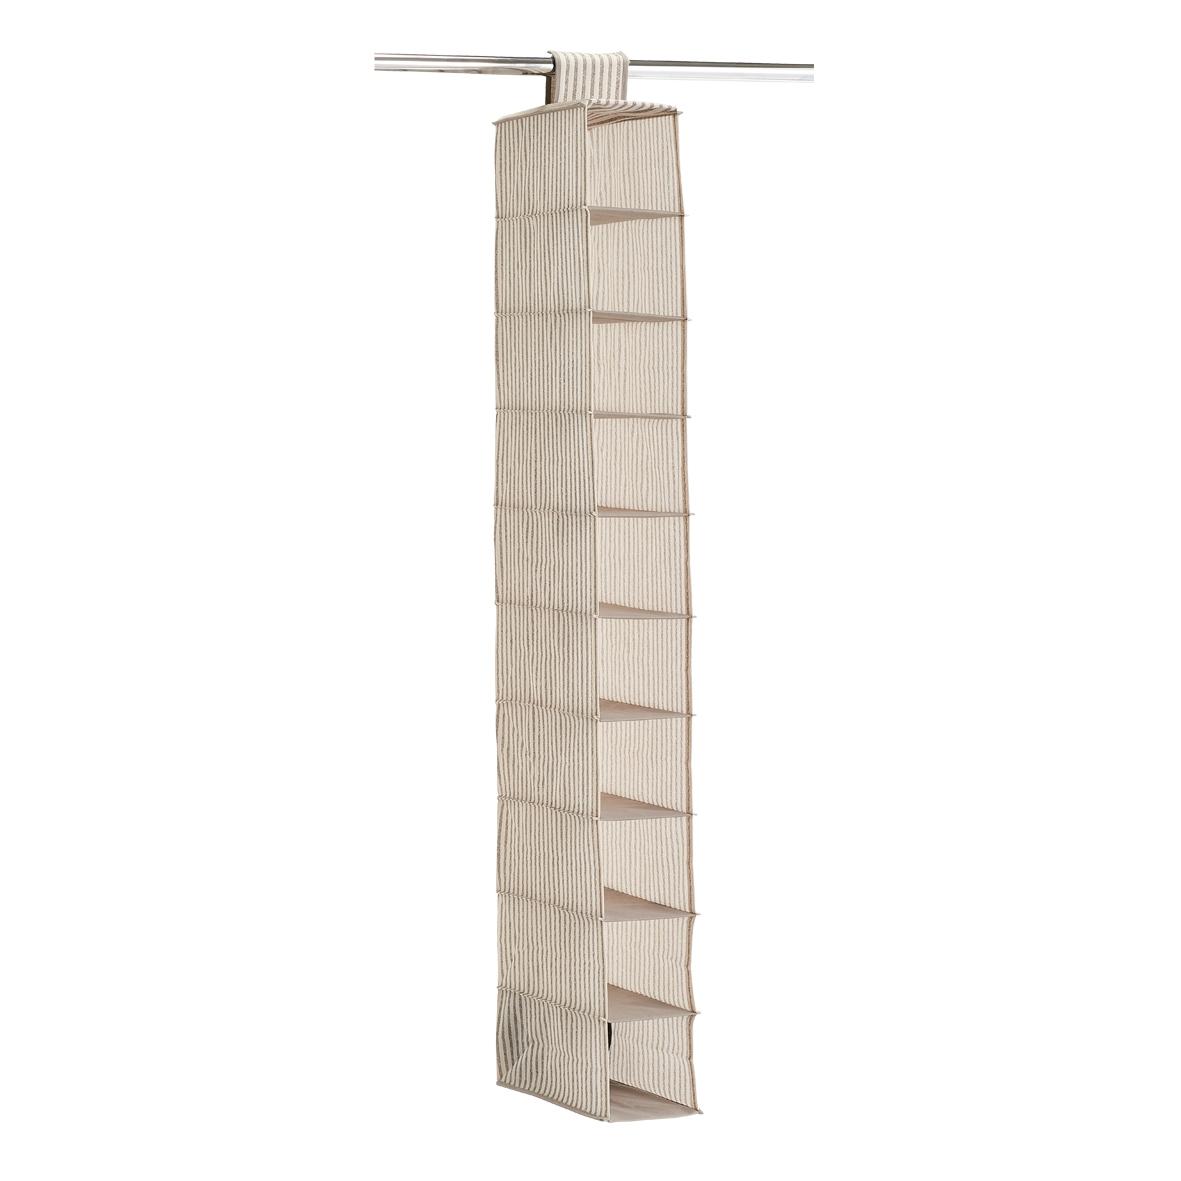 Organizator textil pentru dulap, Bej Stripes, l15xA30xH129 cm imagine